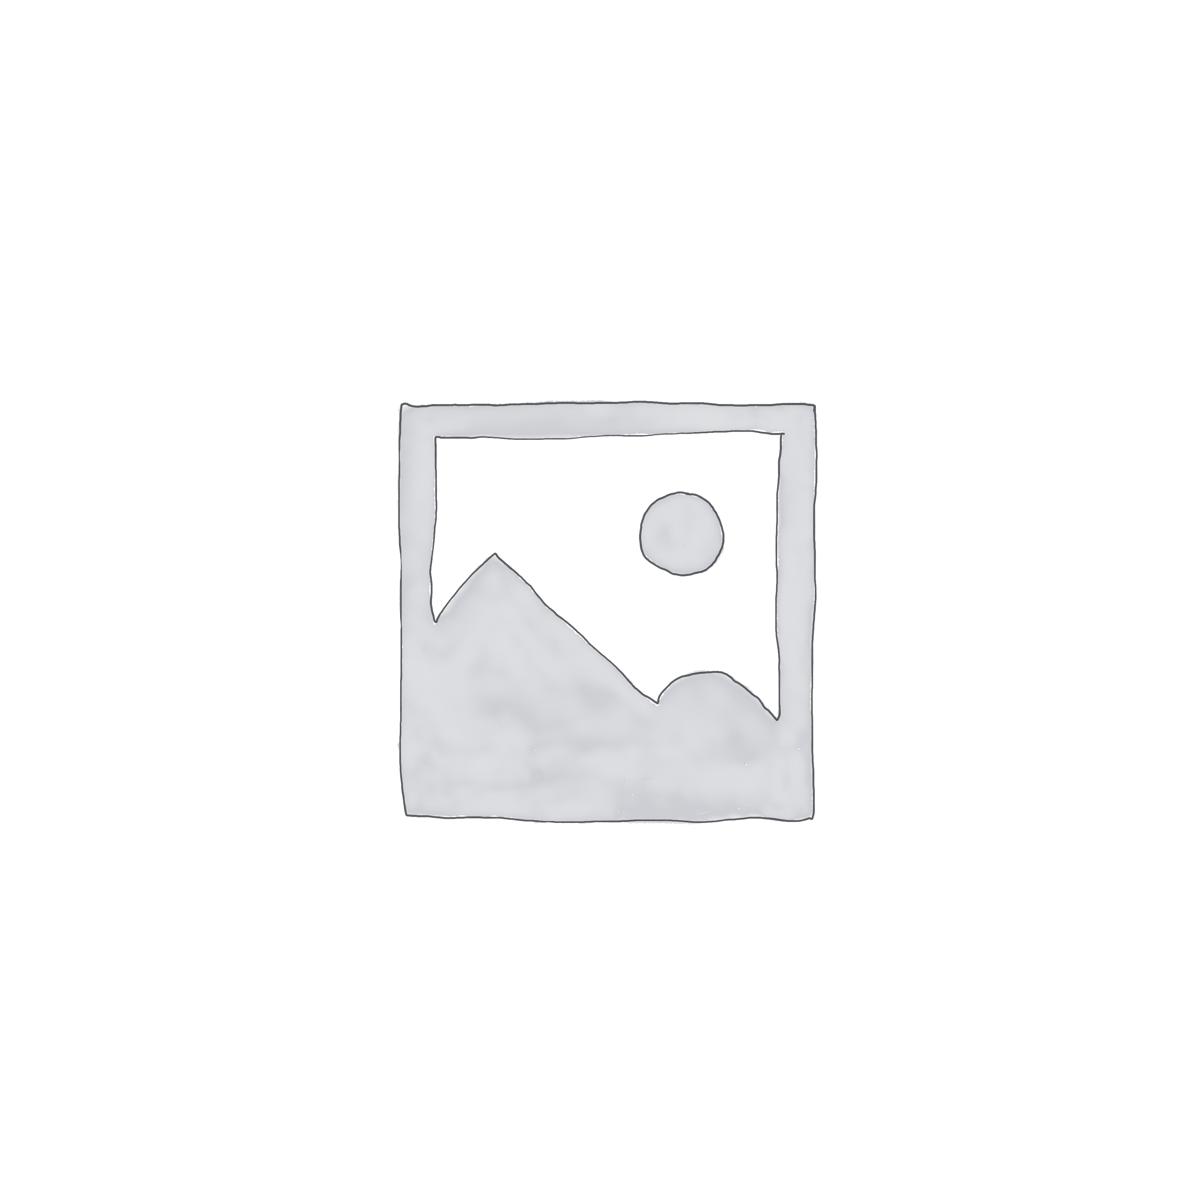 Abstract Colorful Circle Wallpaper Mural